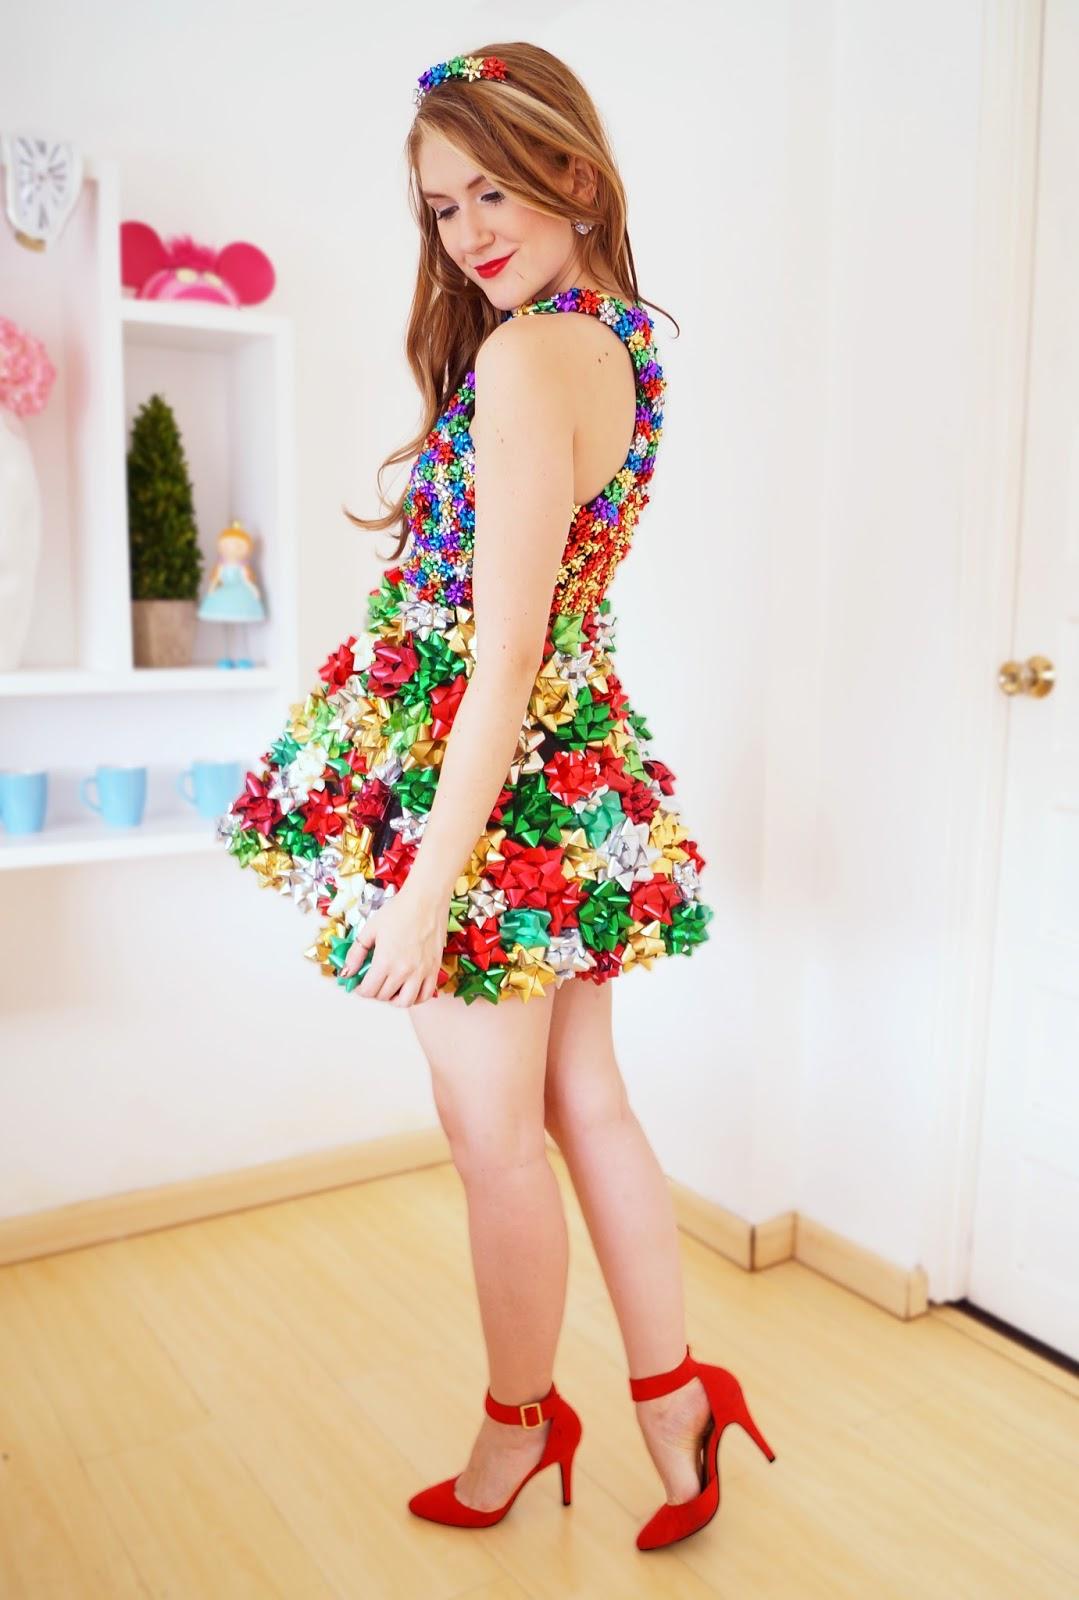 Cute Christmas Outfit Idea